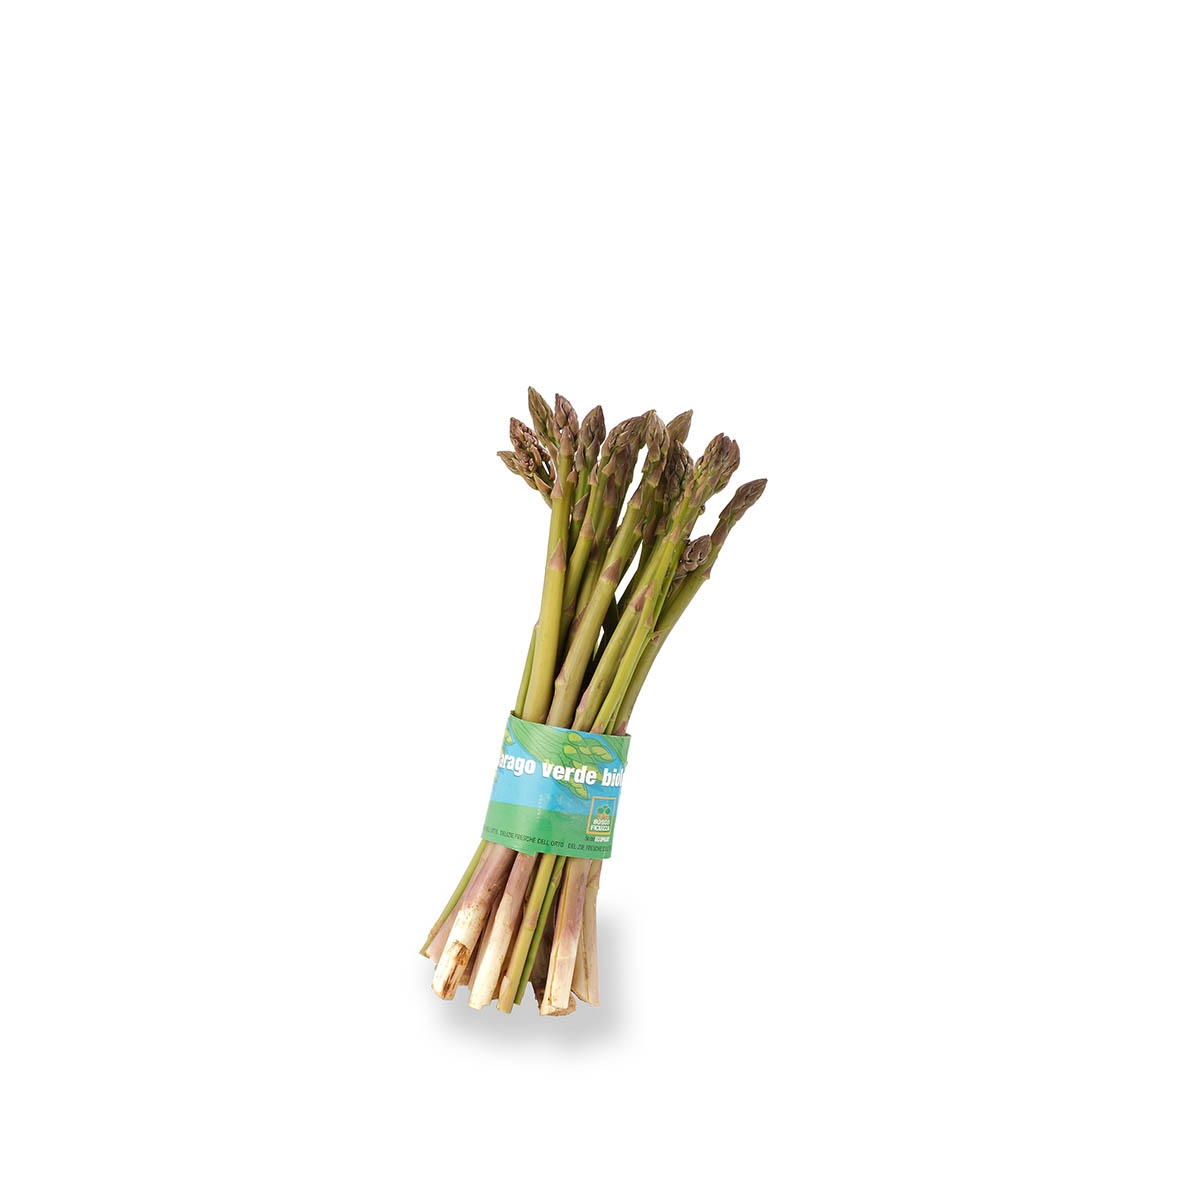 Asparagi verdi bio promozione!